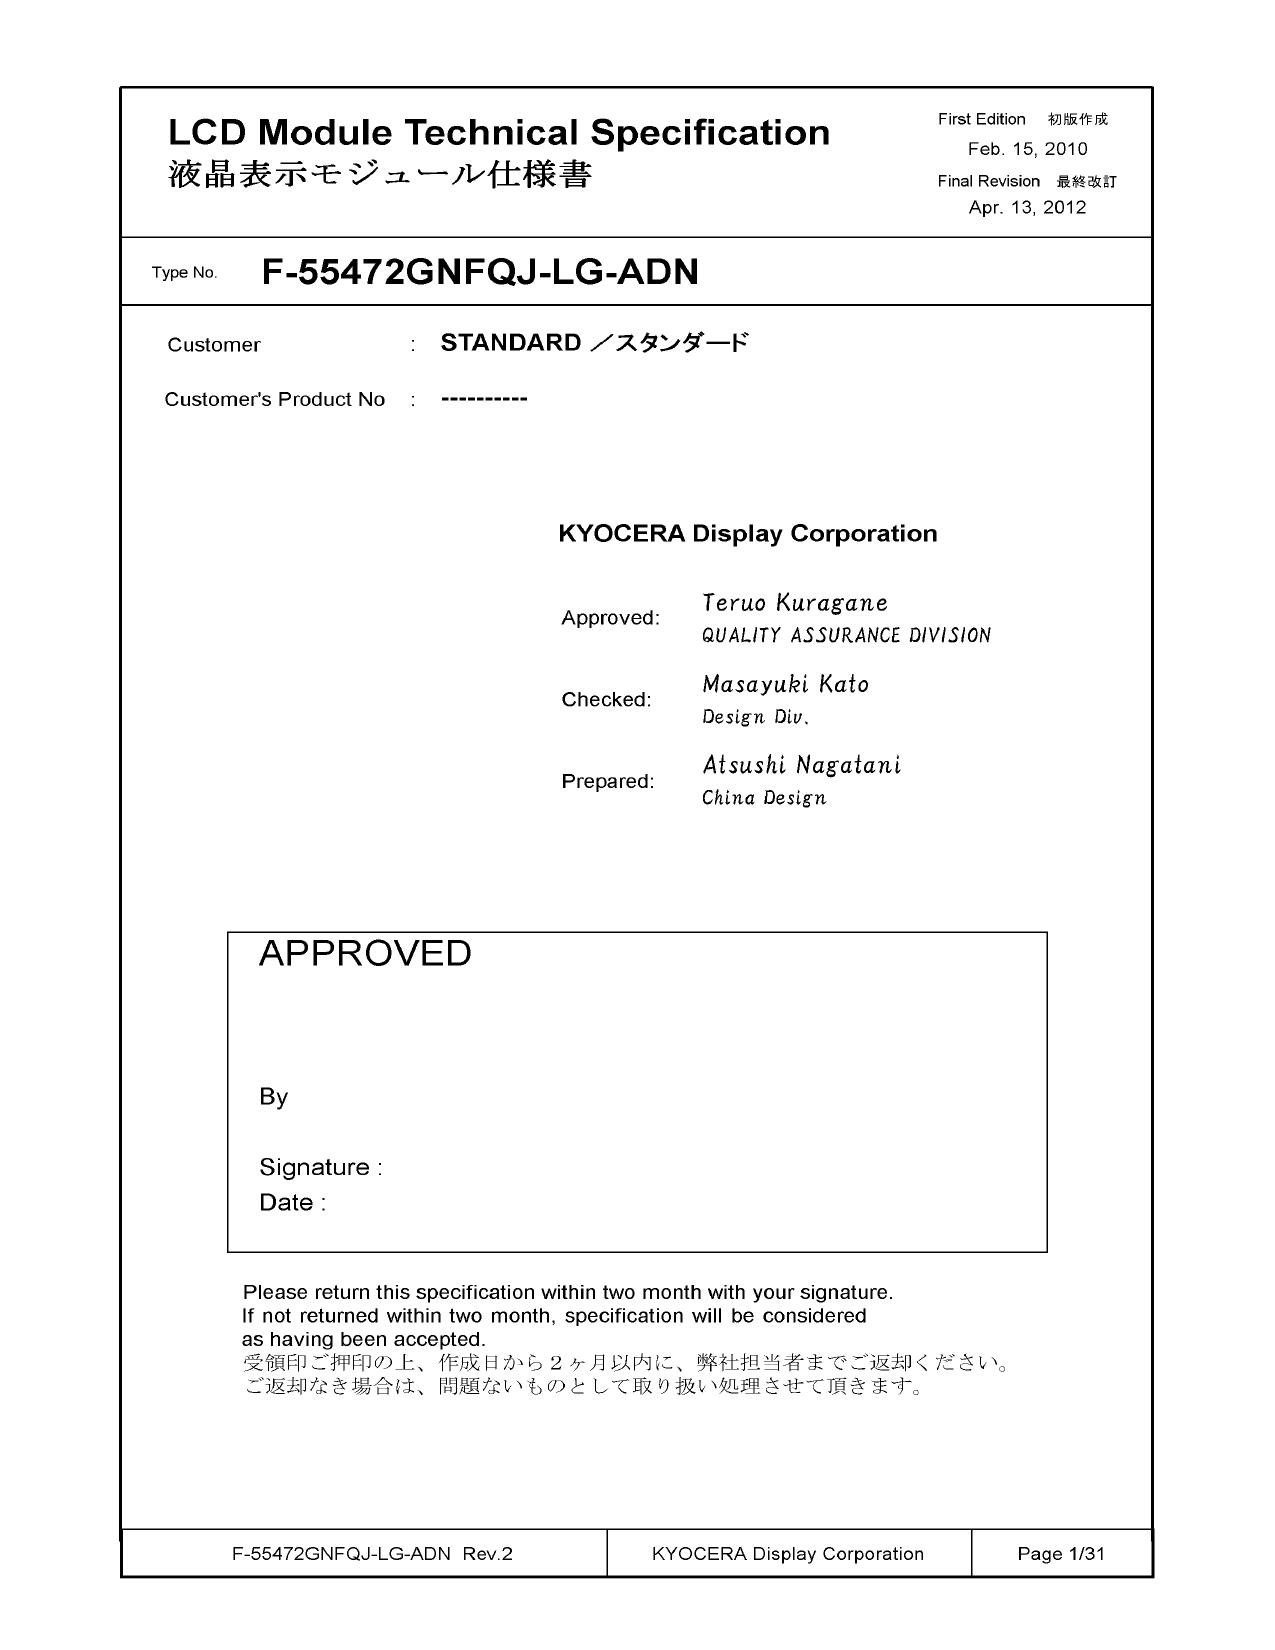 F-55472GNFQJ-LG-ADN datasheet